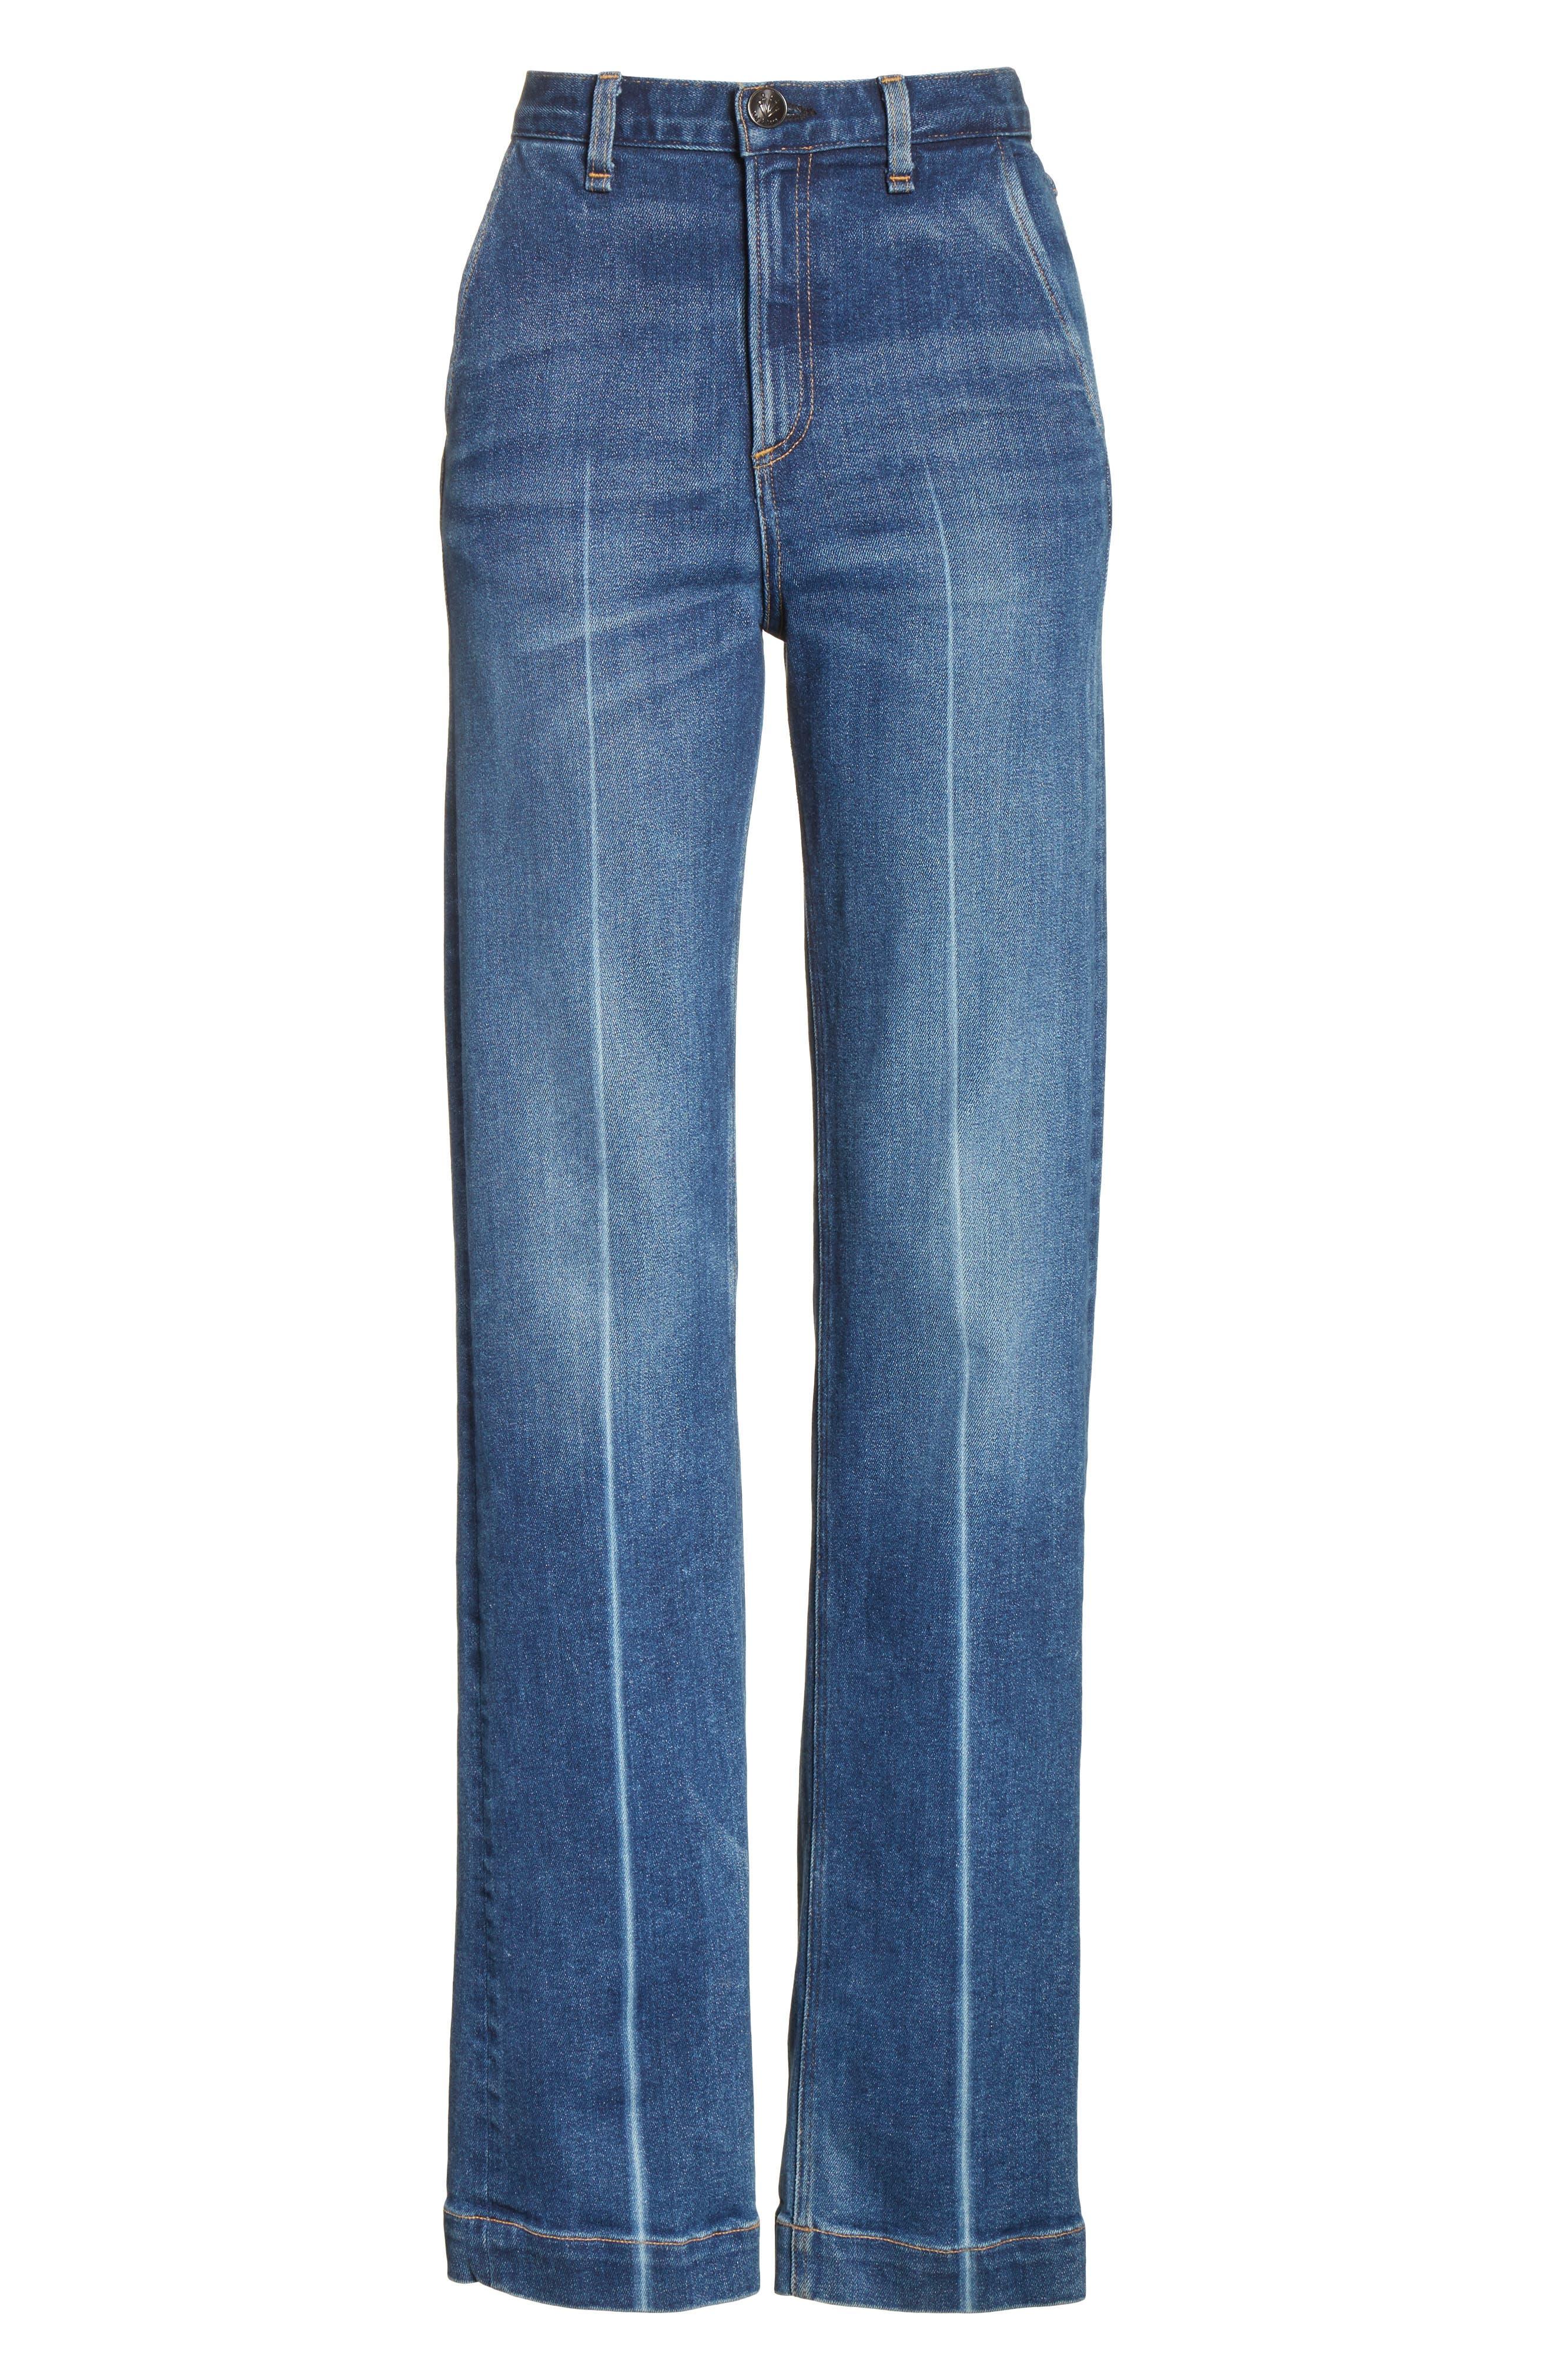 Justine High Waist Trouser Jeans,                             Alternate thumbnail 6, color,                             462